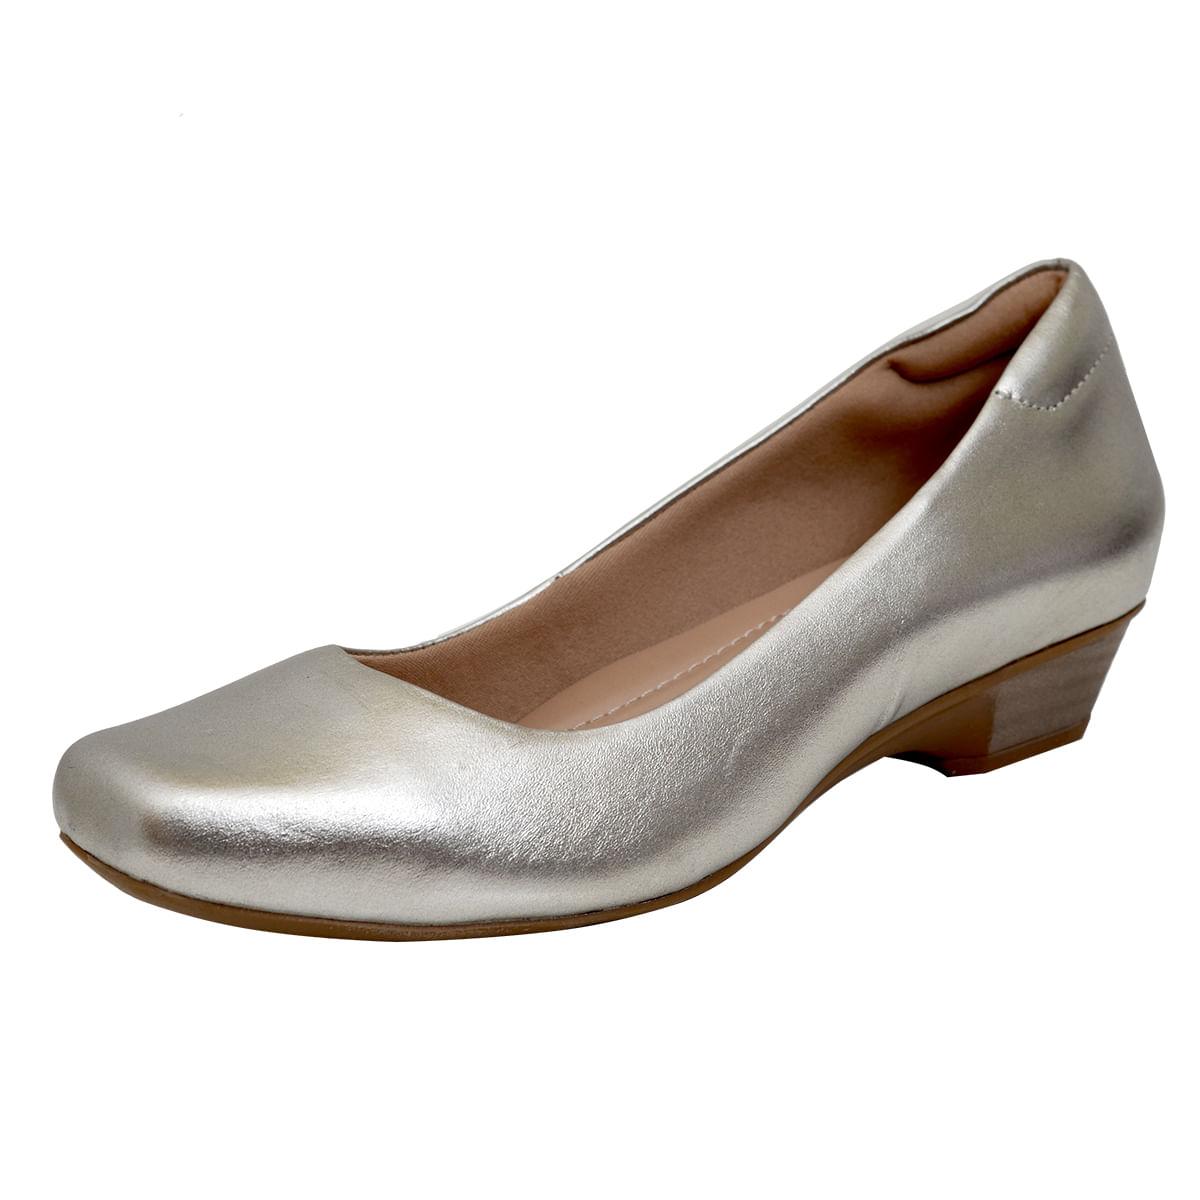 65ebf89cd Sapato fechado confort Prata Velho - Laura Prado